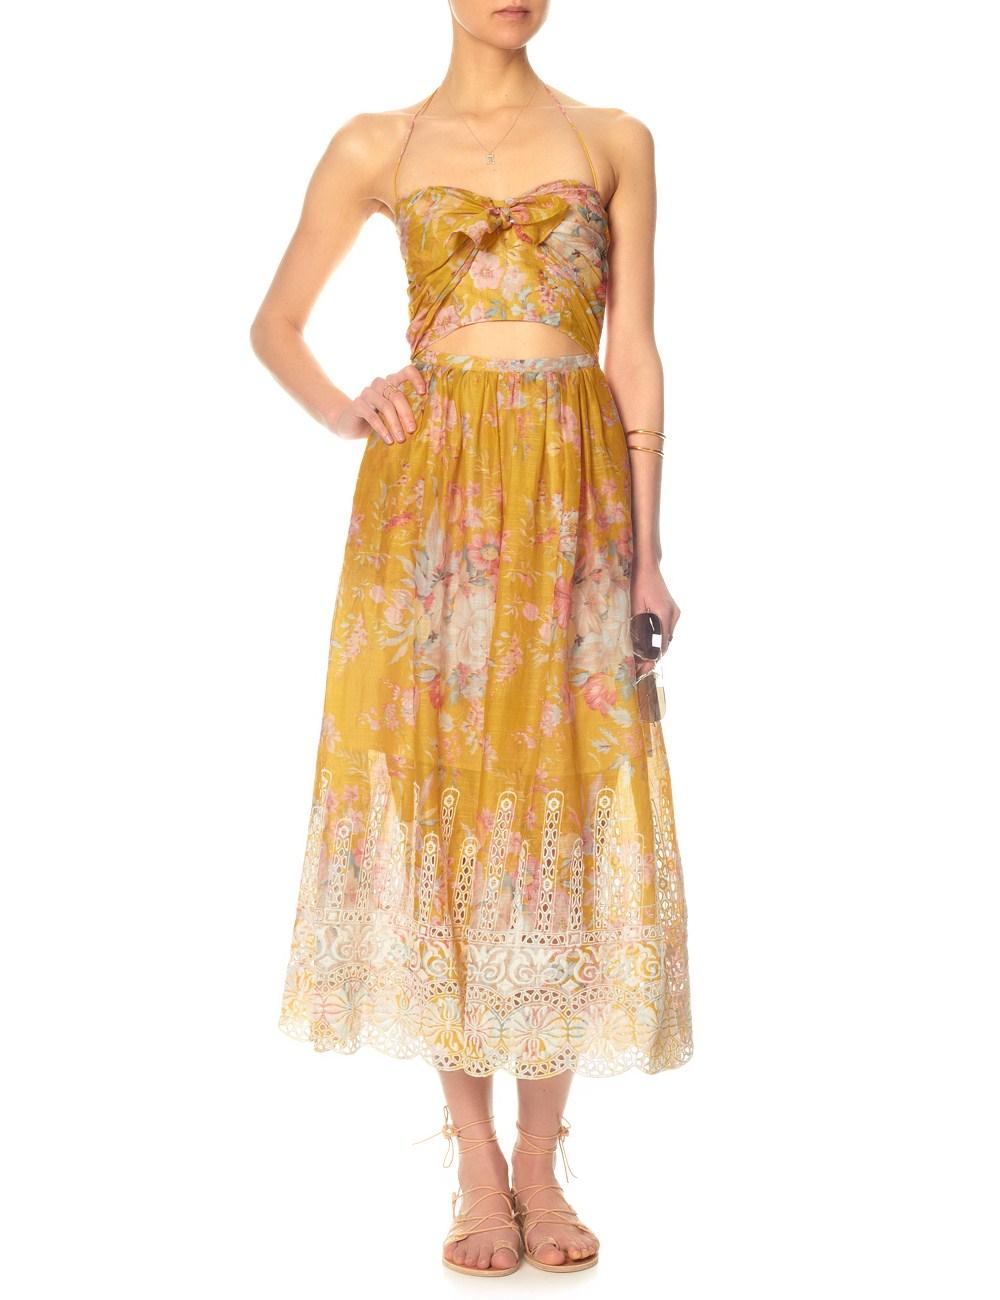 zimmermann-yellow-mustard-floral-cotton-scallop-dress-product-1-25666836-3-928201184-normal.jpg